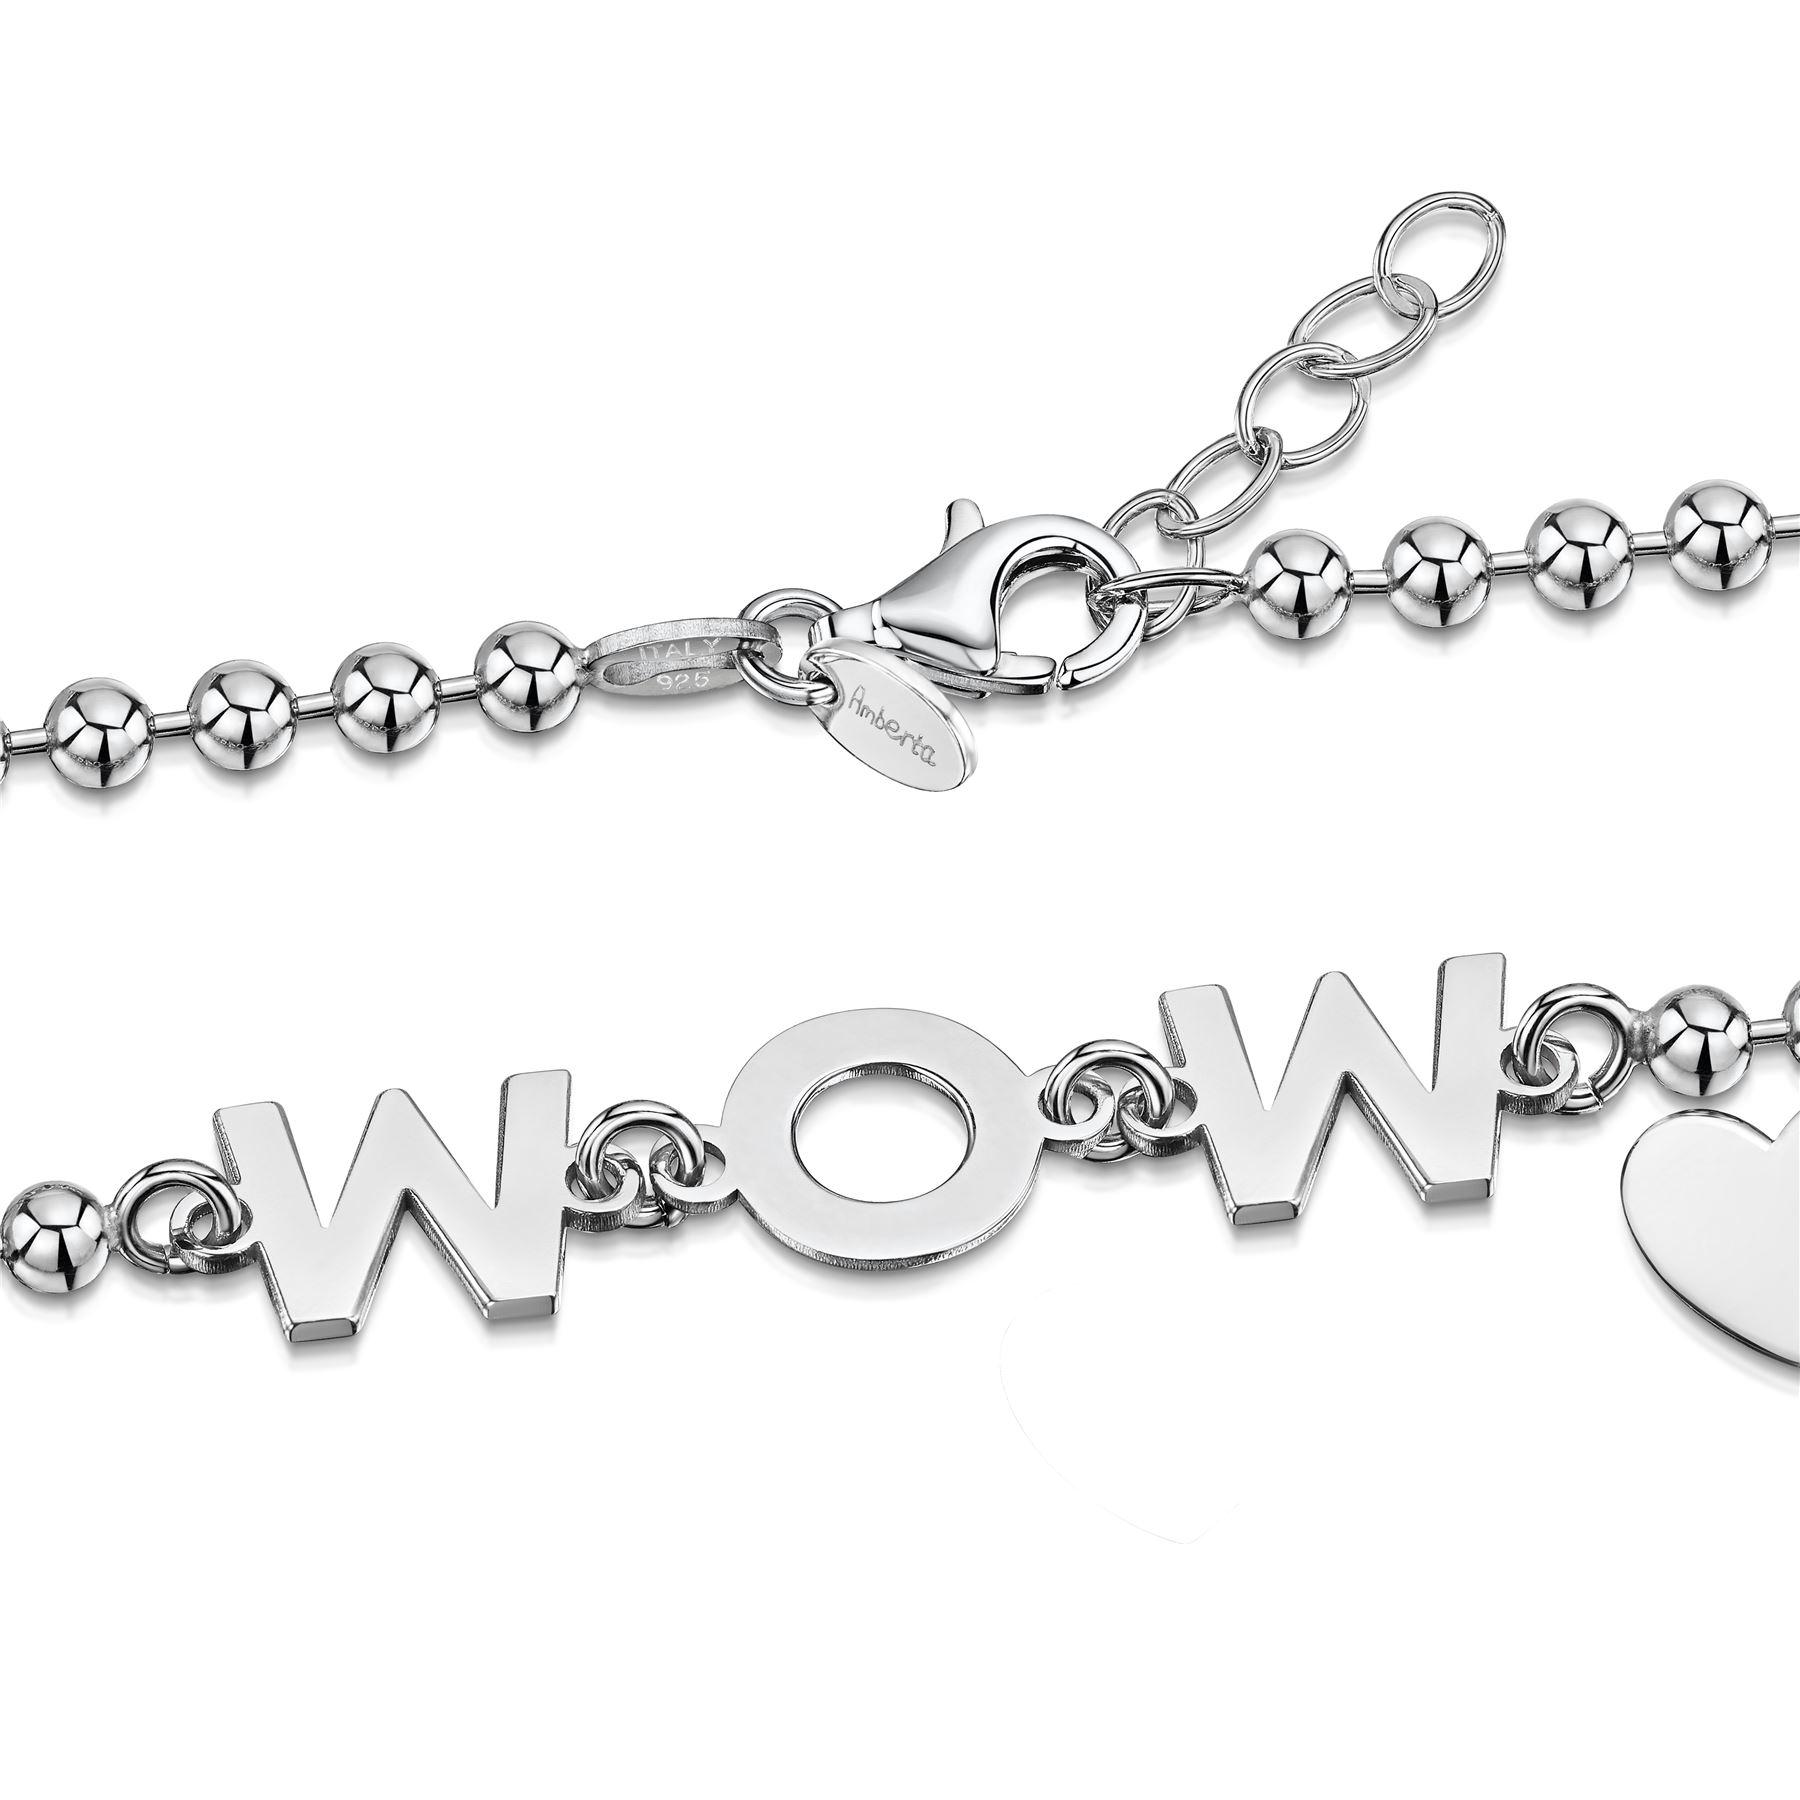 Amberta-Jewelry-925-Sterling-Silver-Adjustable-Bracelet-Italian-Bangle-for-Women thumbnail 83